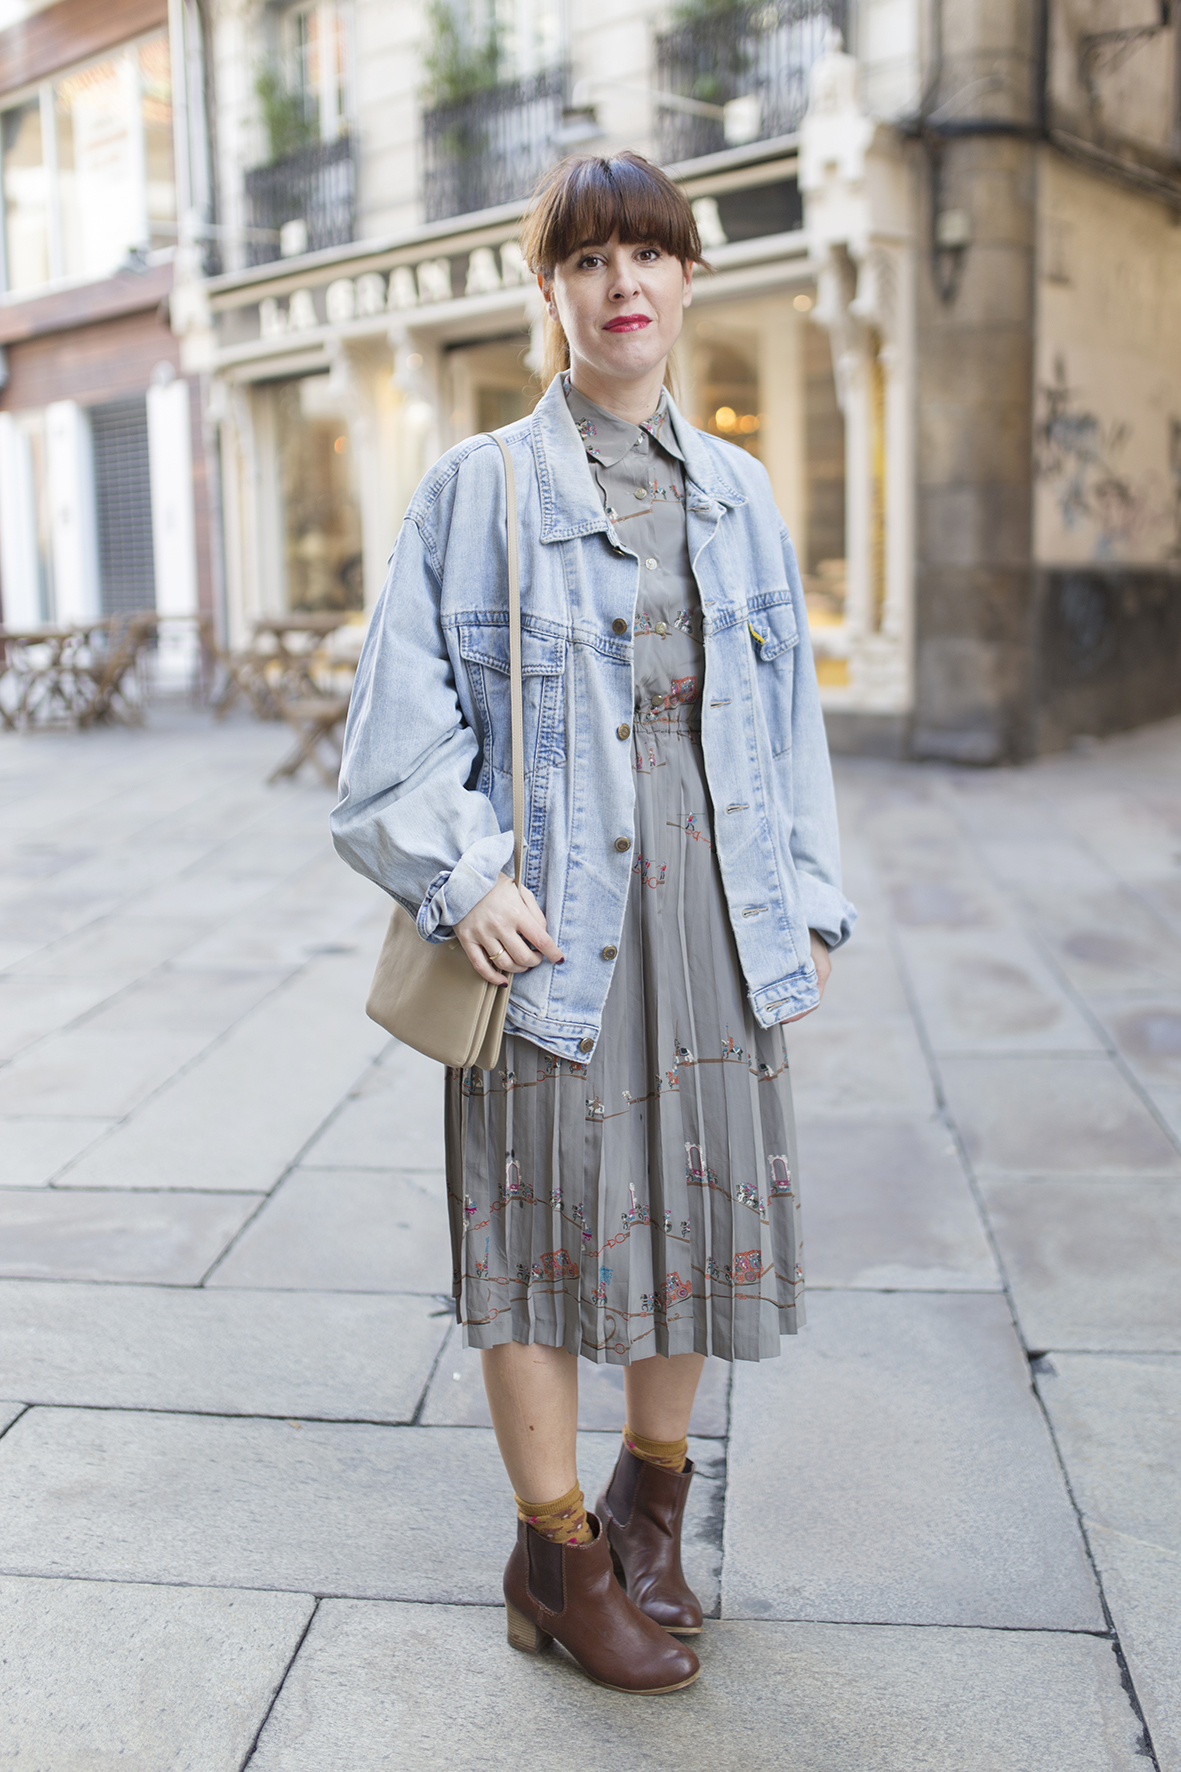 descalzaporelparque-style- look- ootd-moda-calle- denim jacket- streetstyle - coruña -galicia-alba cuesta